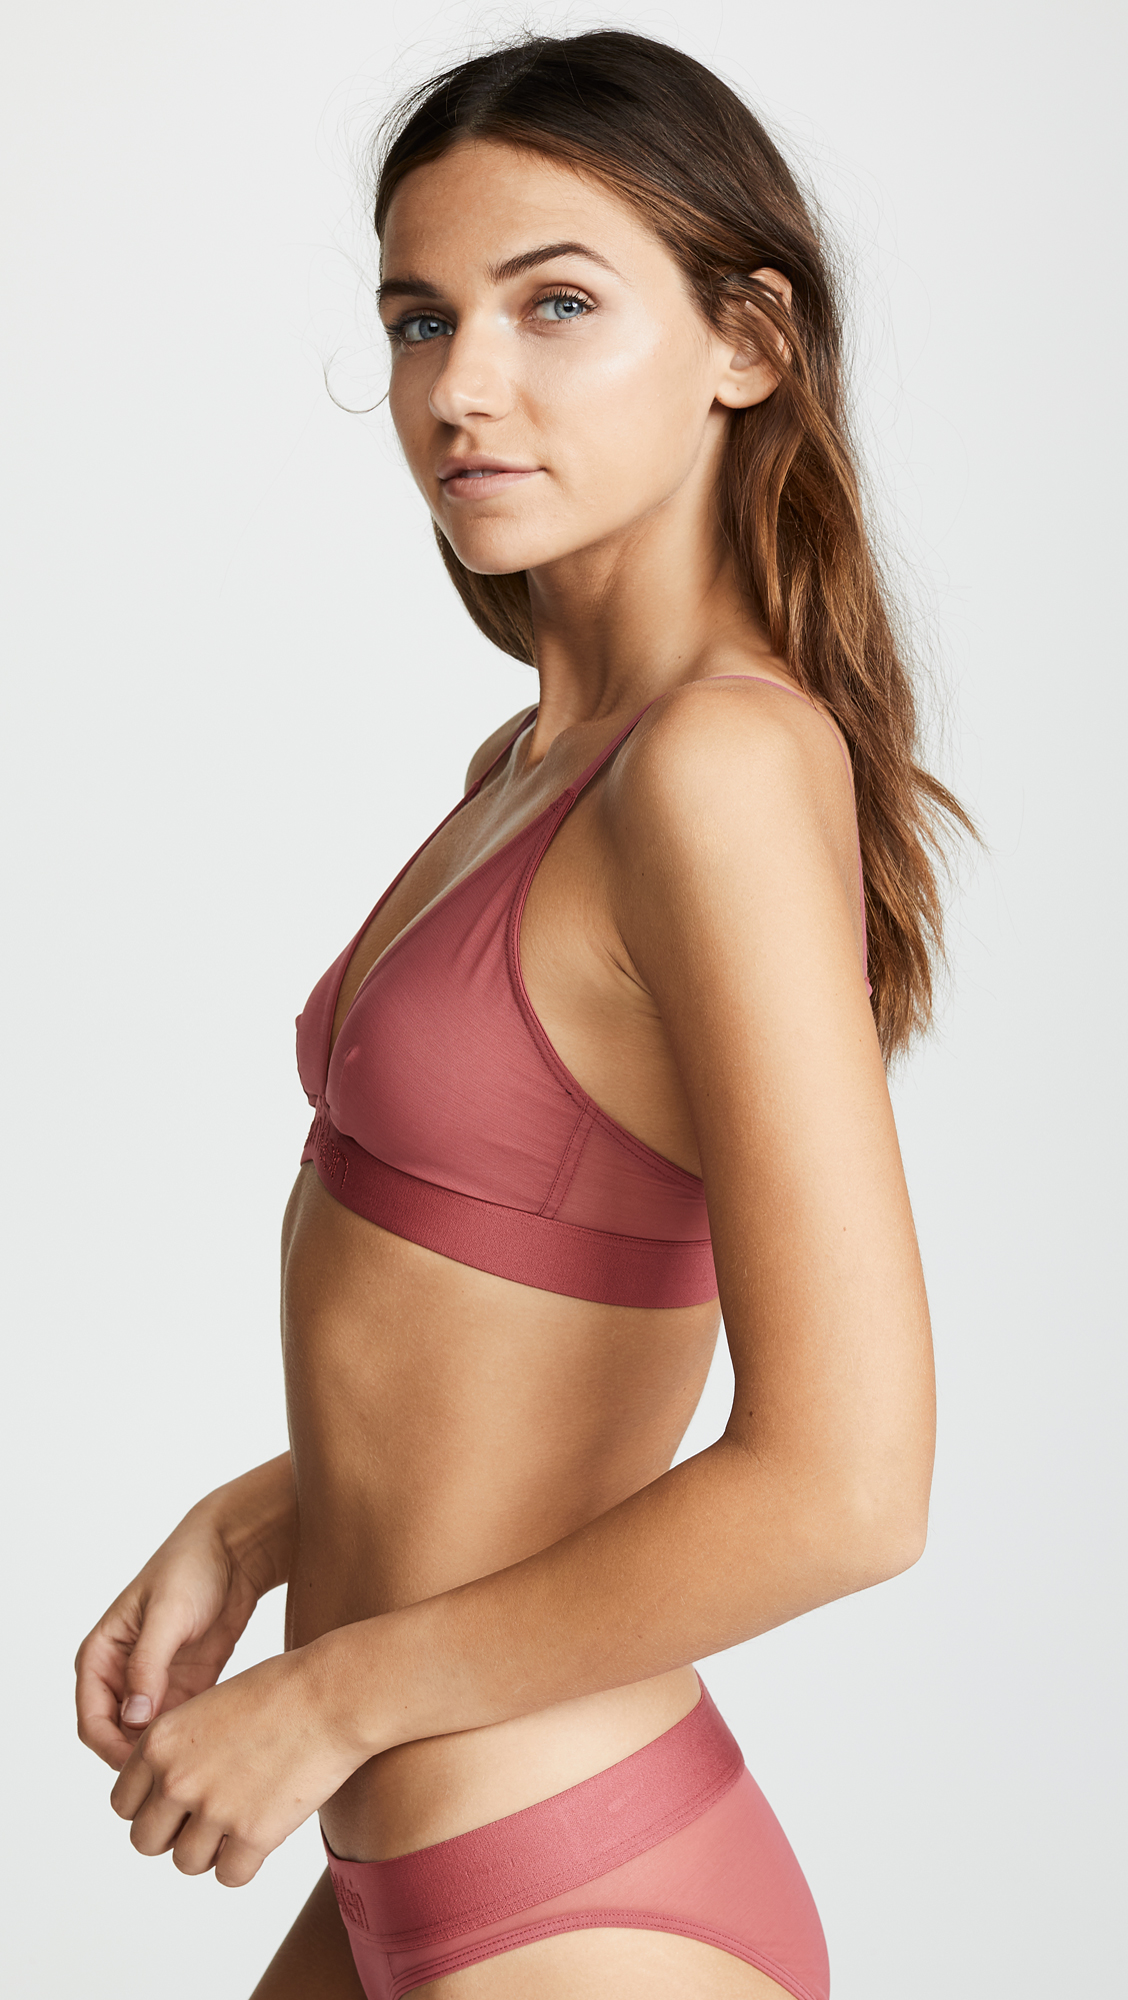 cf81226428c6c0 Calvin Klein Underwear Tonal Logo Unlined Triangle Bra